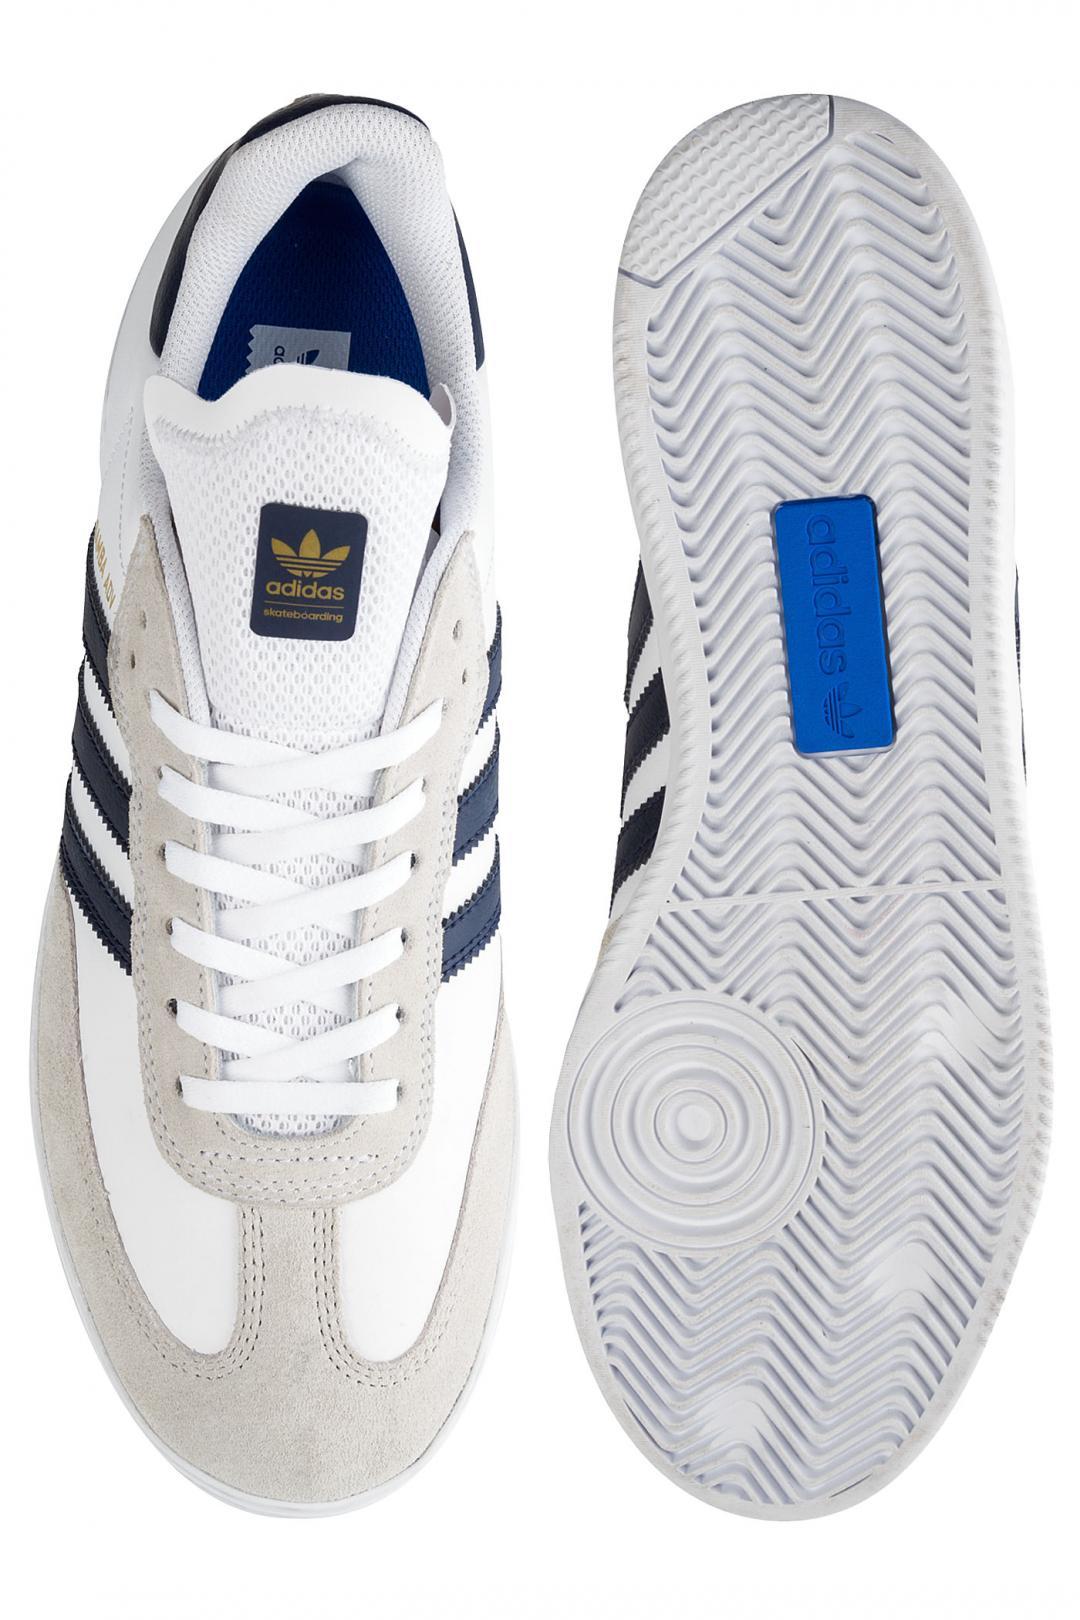 Uomo adidas Skateboarding Samba ADV white navy gold   Sneaker